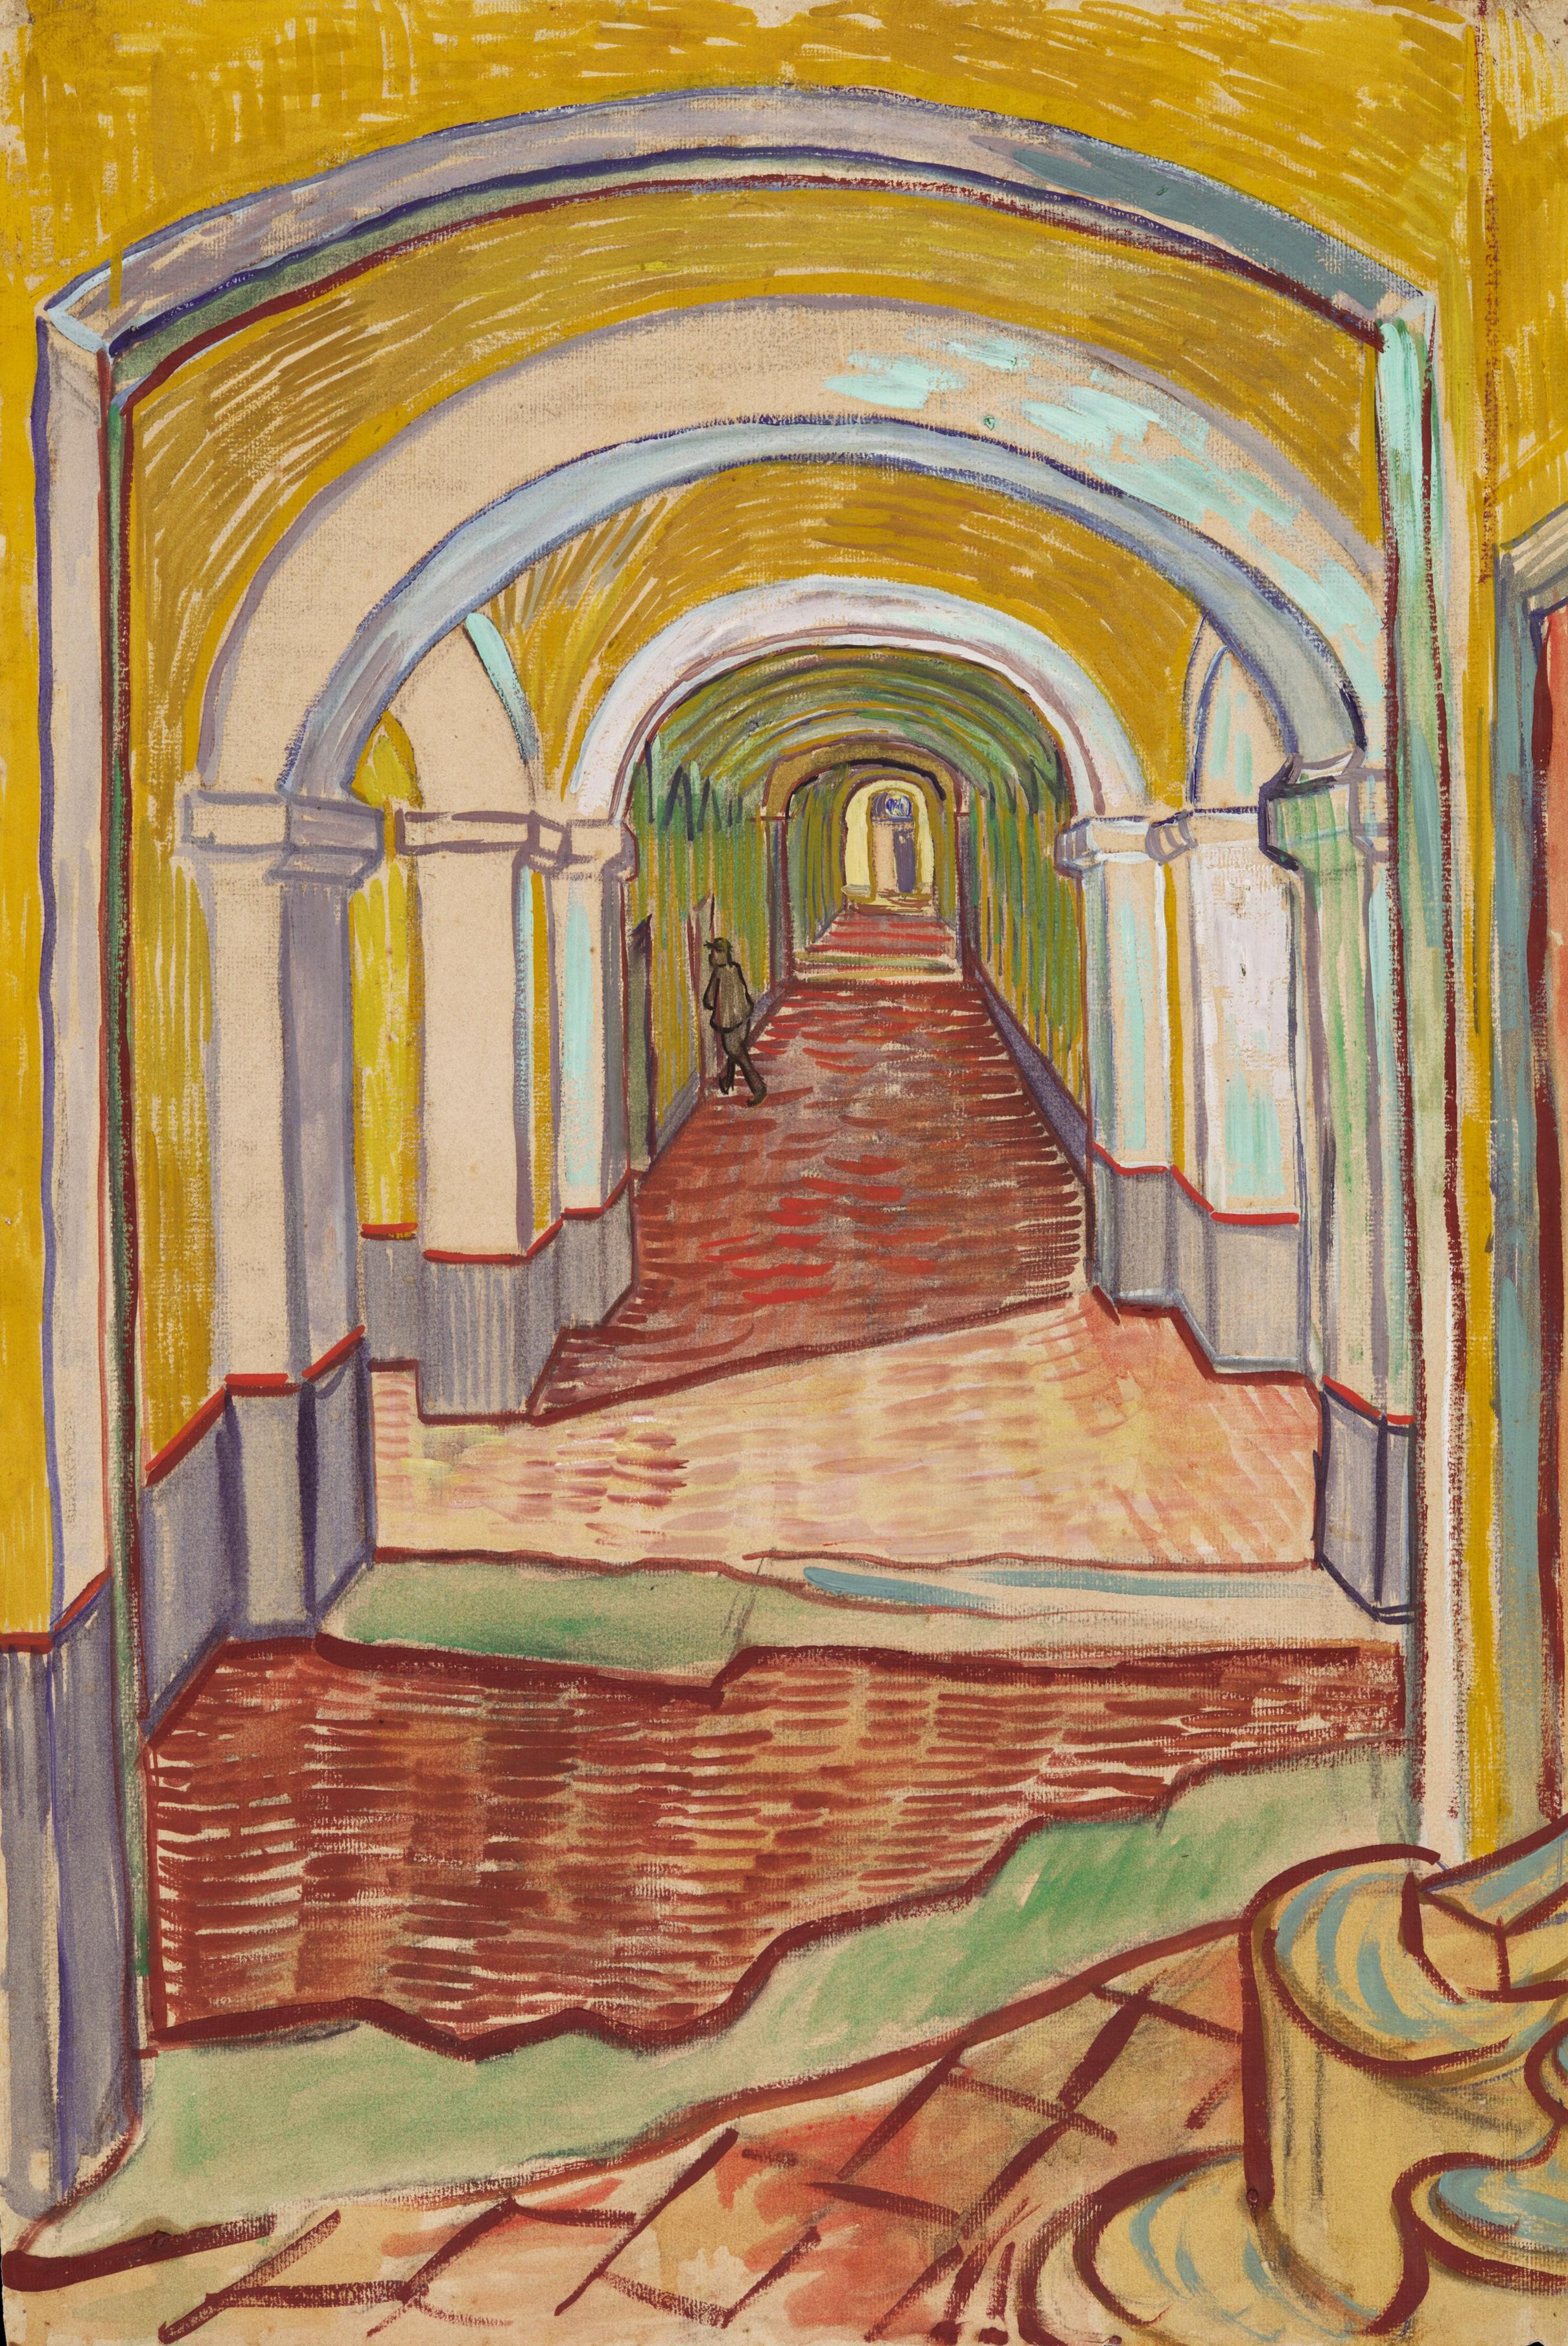 Corridor in the Asylum by Van Gogh Fine Art